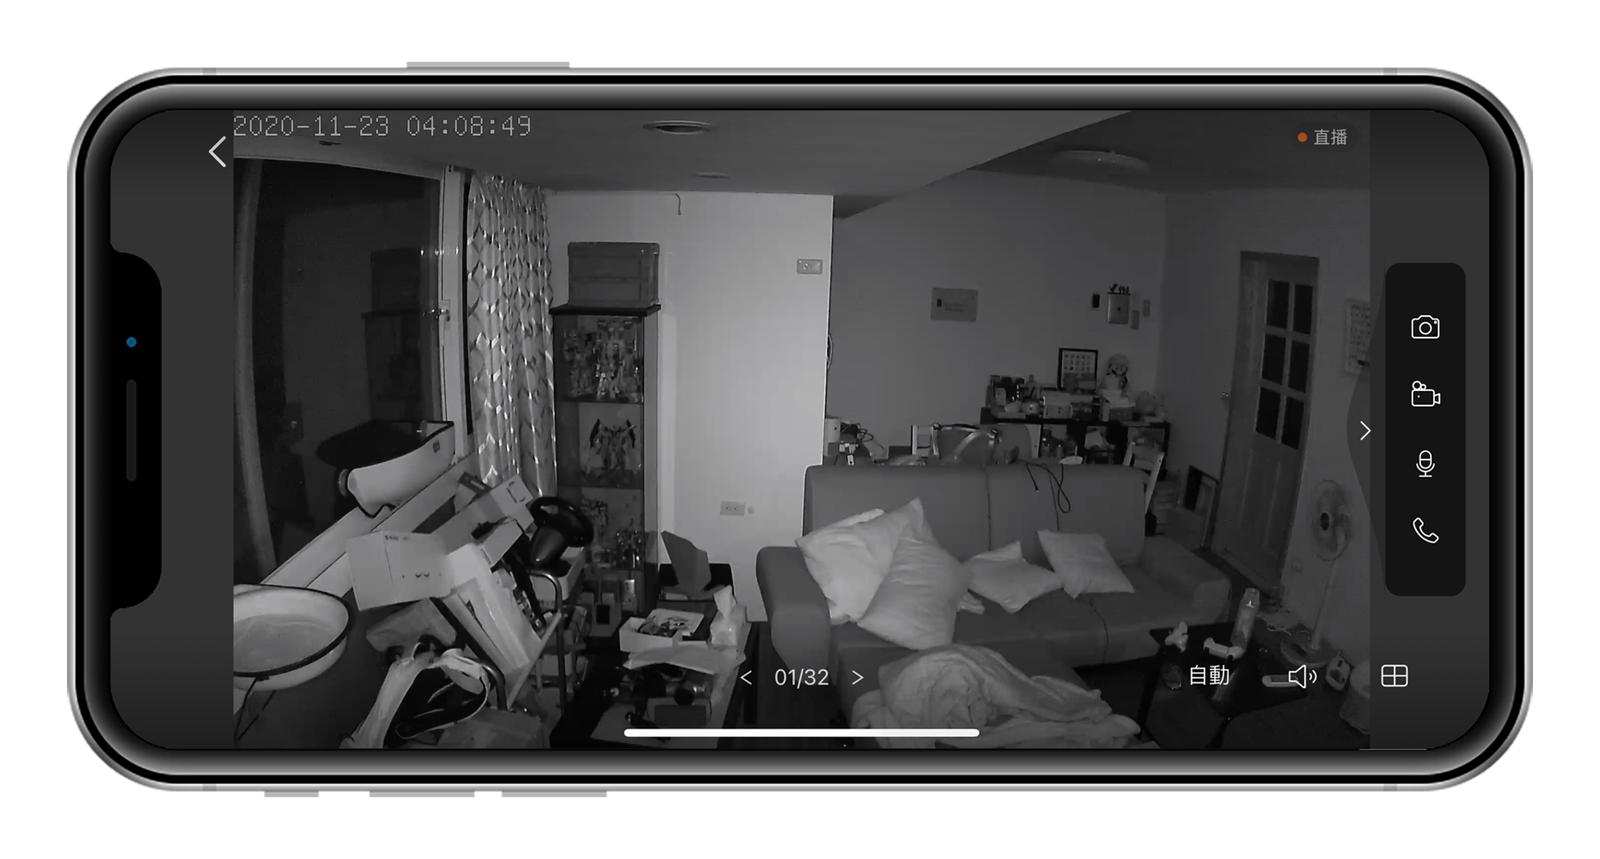 TP-Link Tapo C310 室外安全 Wi-Fi 攝影機!智慧、簡單、好用的居家安全守護神 @3C 達人廖阿輝